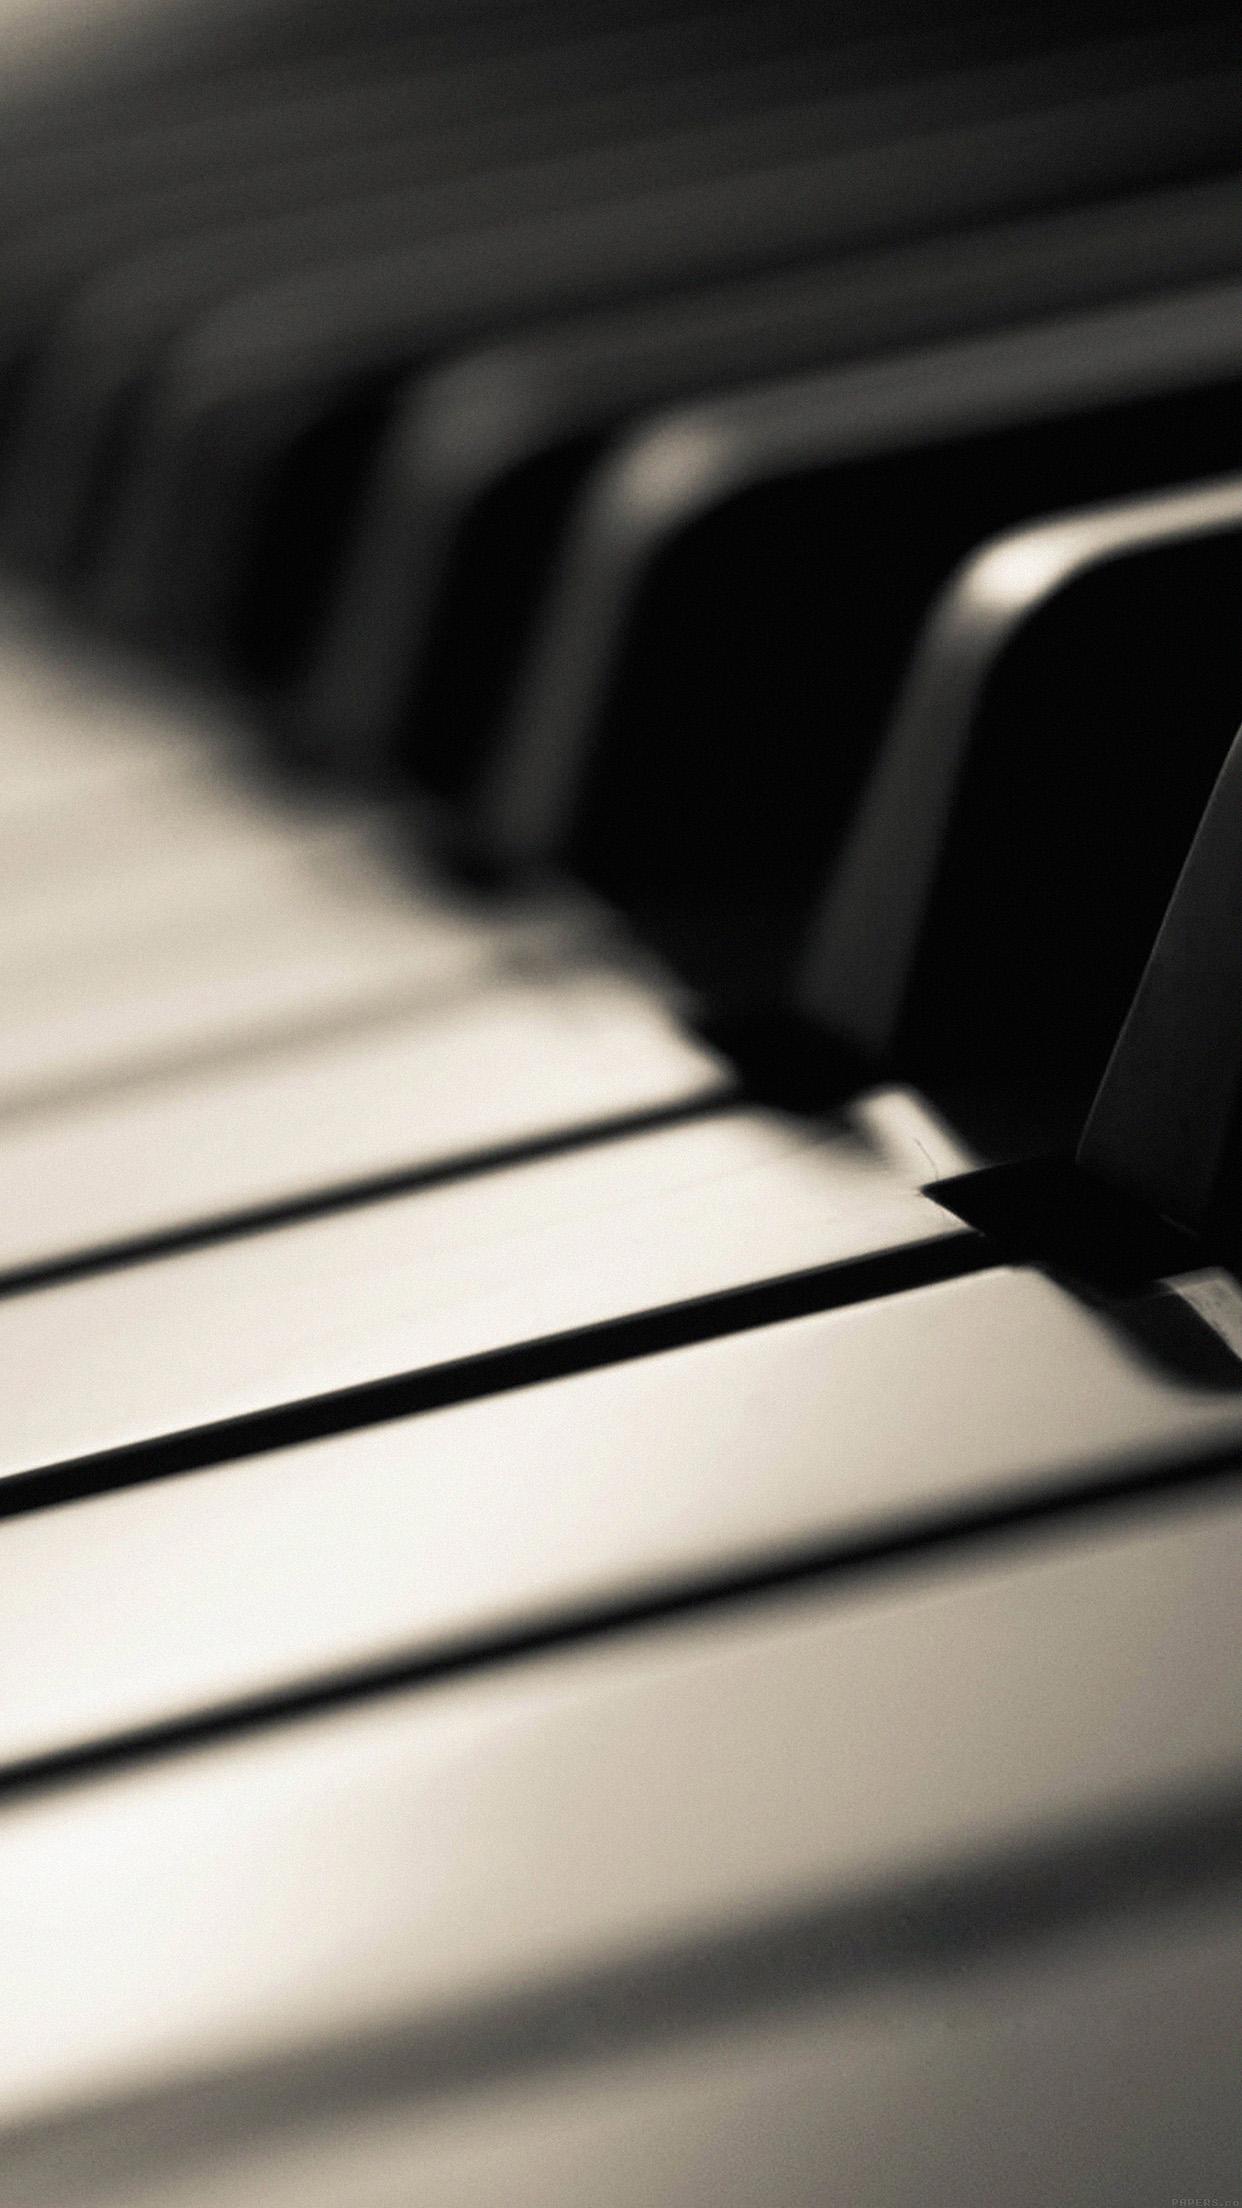 Mj65 Piano Music Romance Art Papers Co